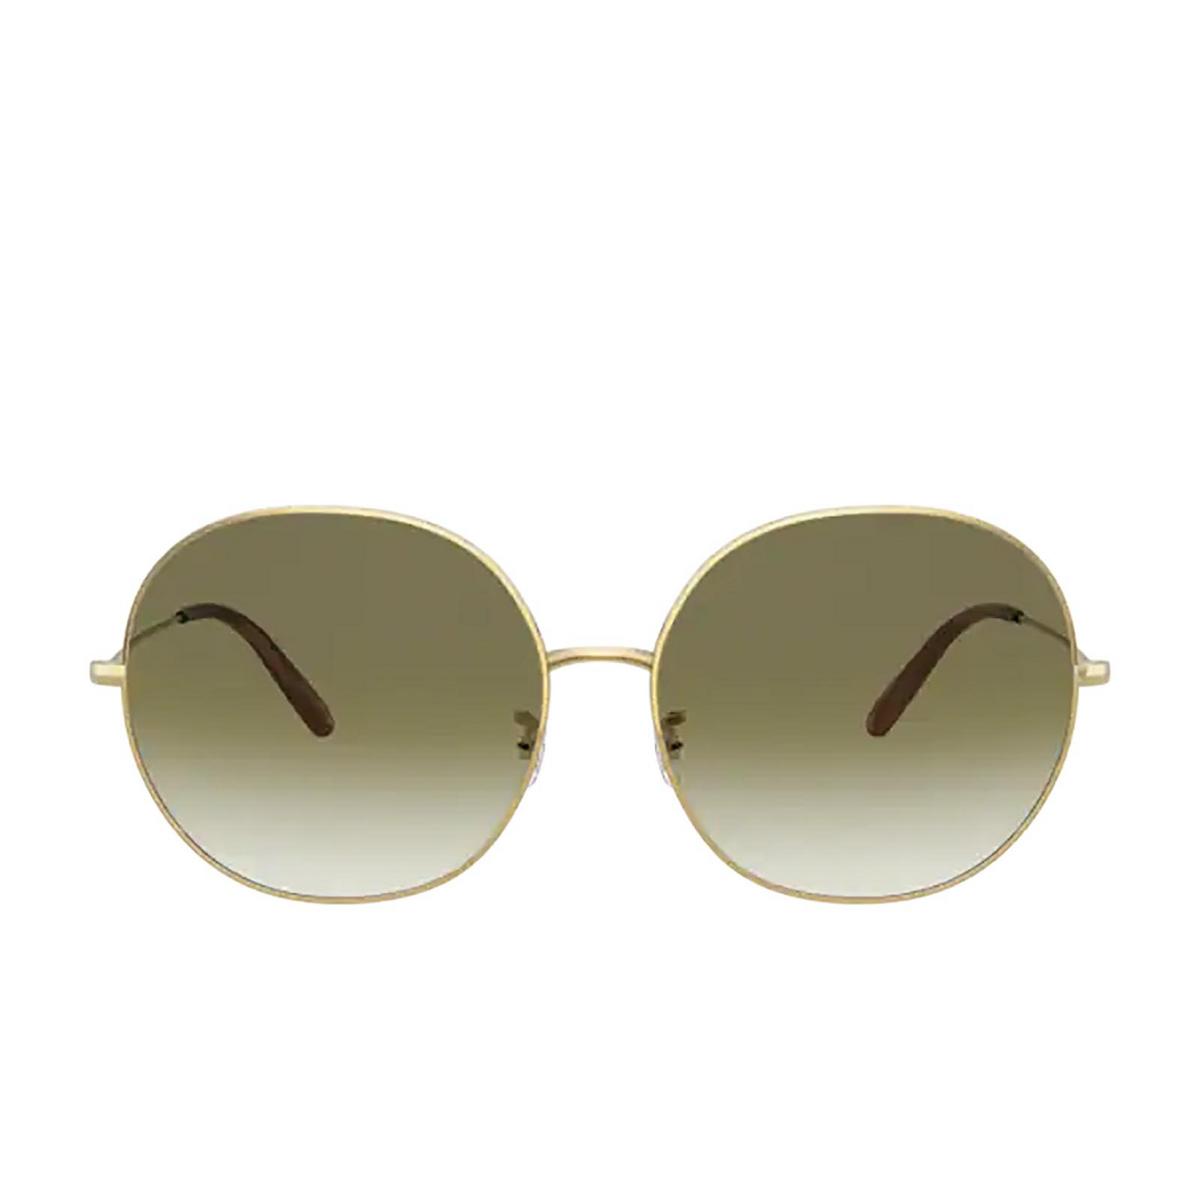 Oliver Peoples® Round Sunglasses: Darlen OV1280S color Gold 50358E.